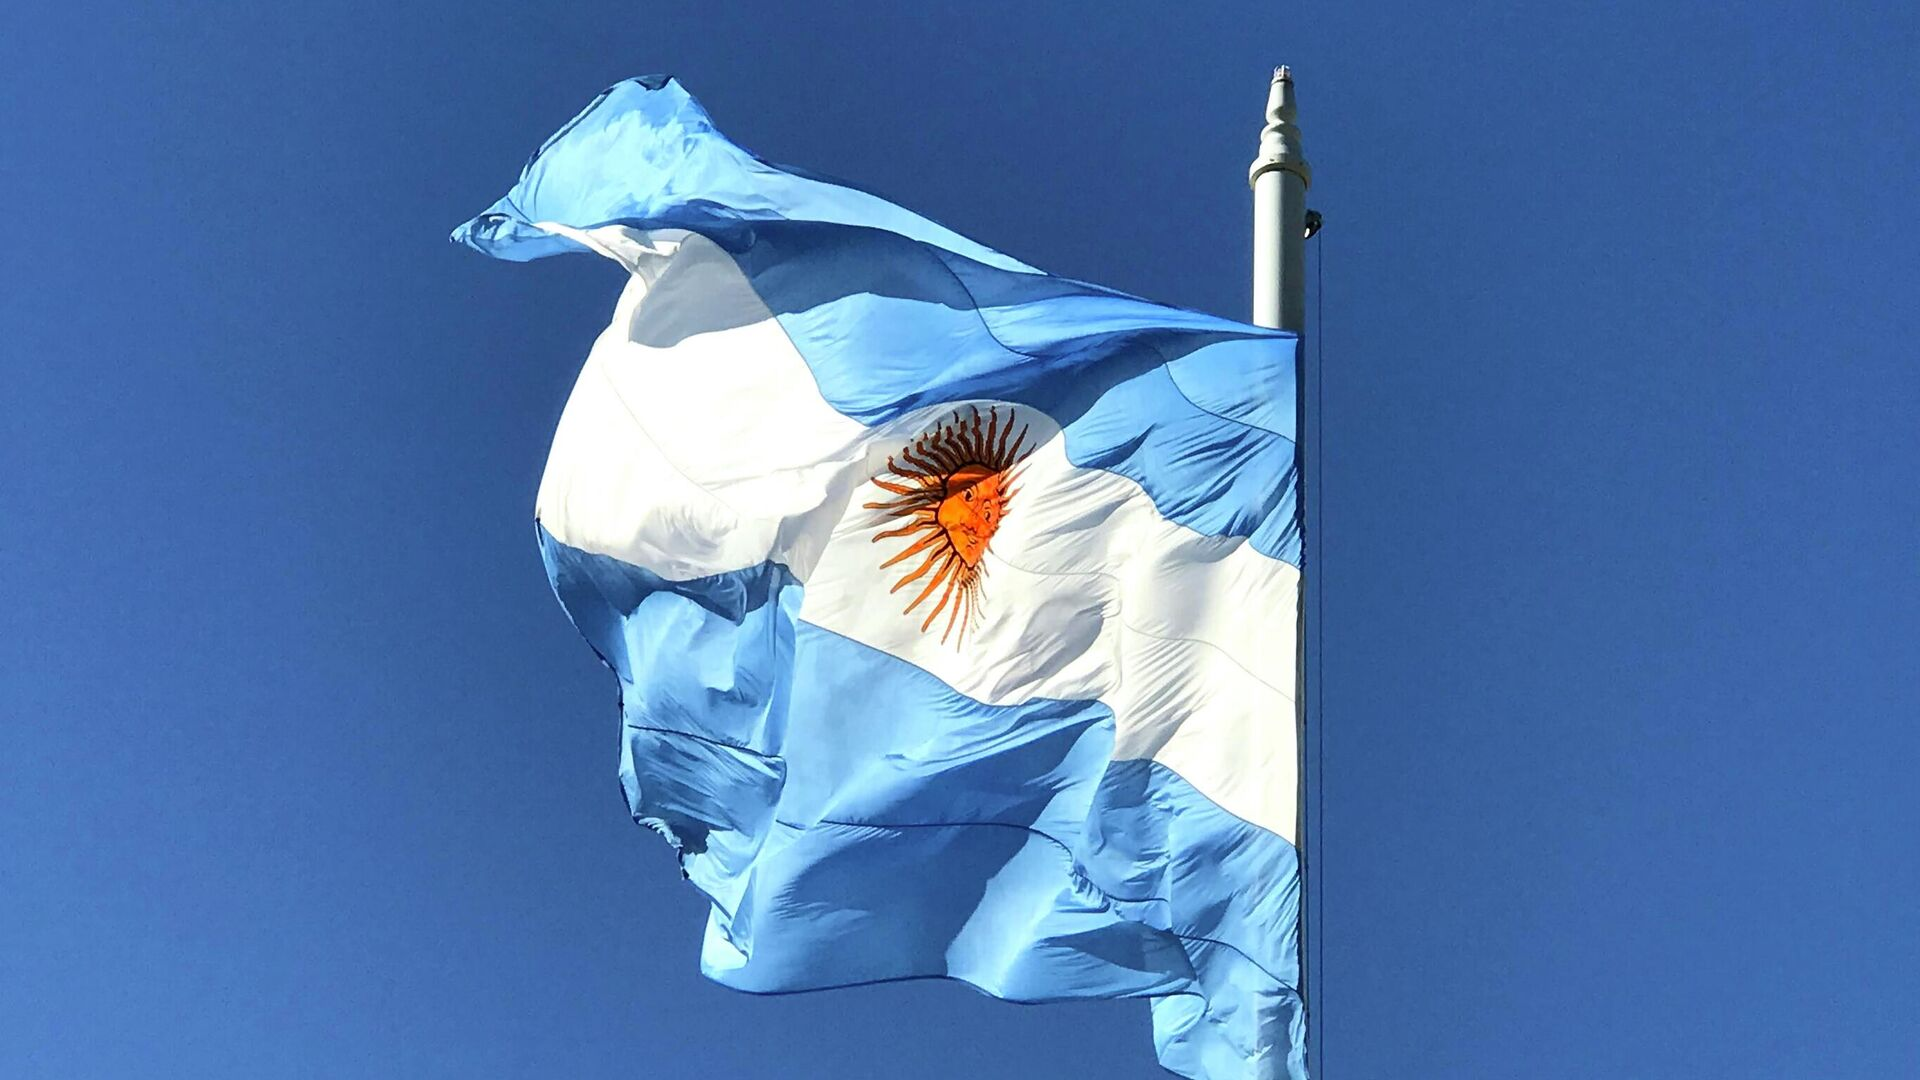 Bandera de Argentina - Sputnik Mundo, 1920, 14.10.2021